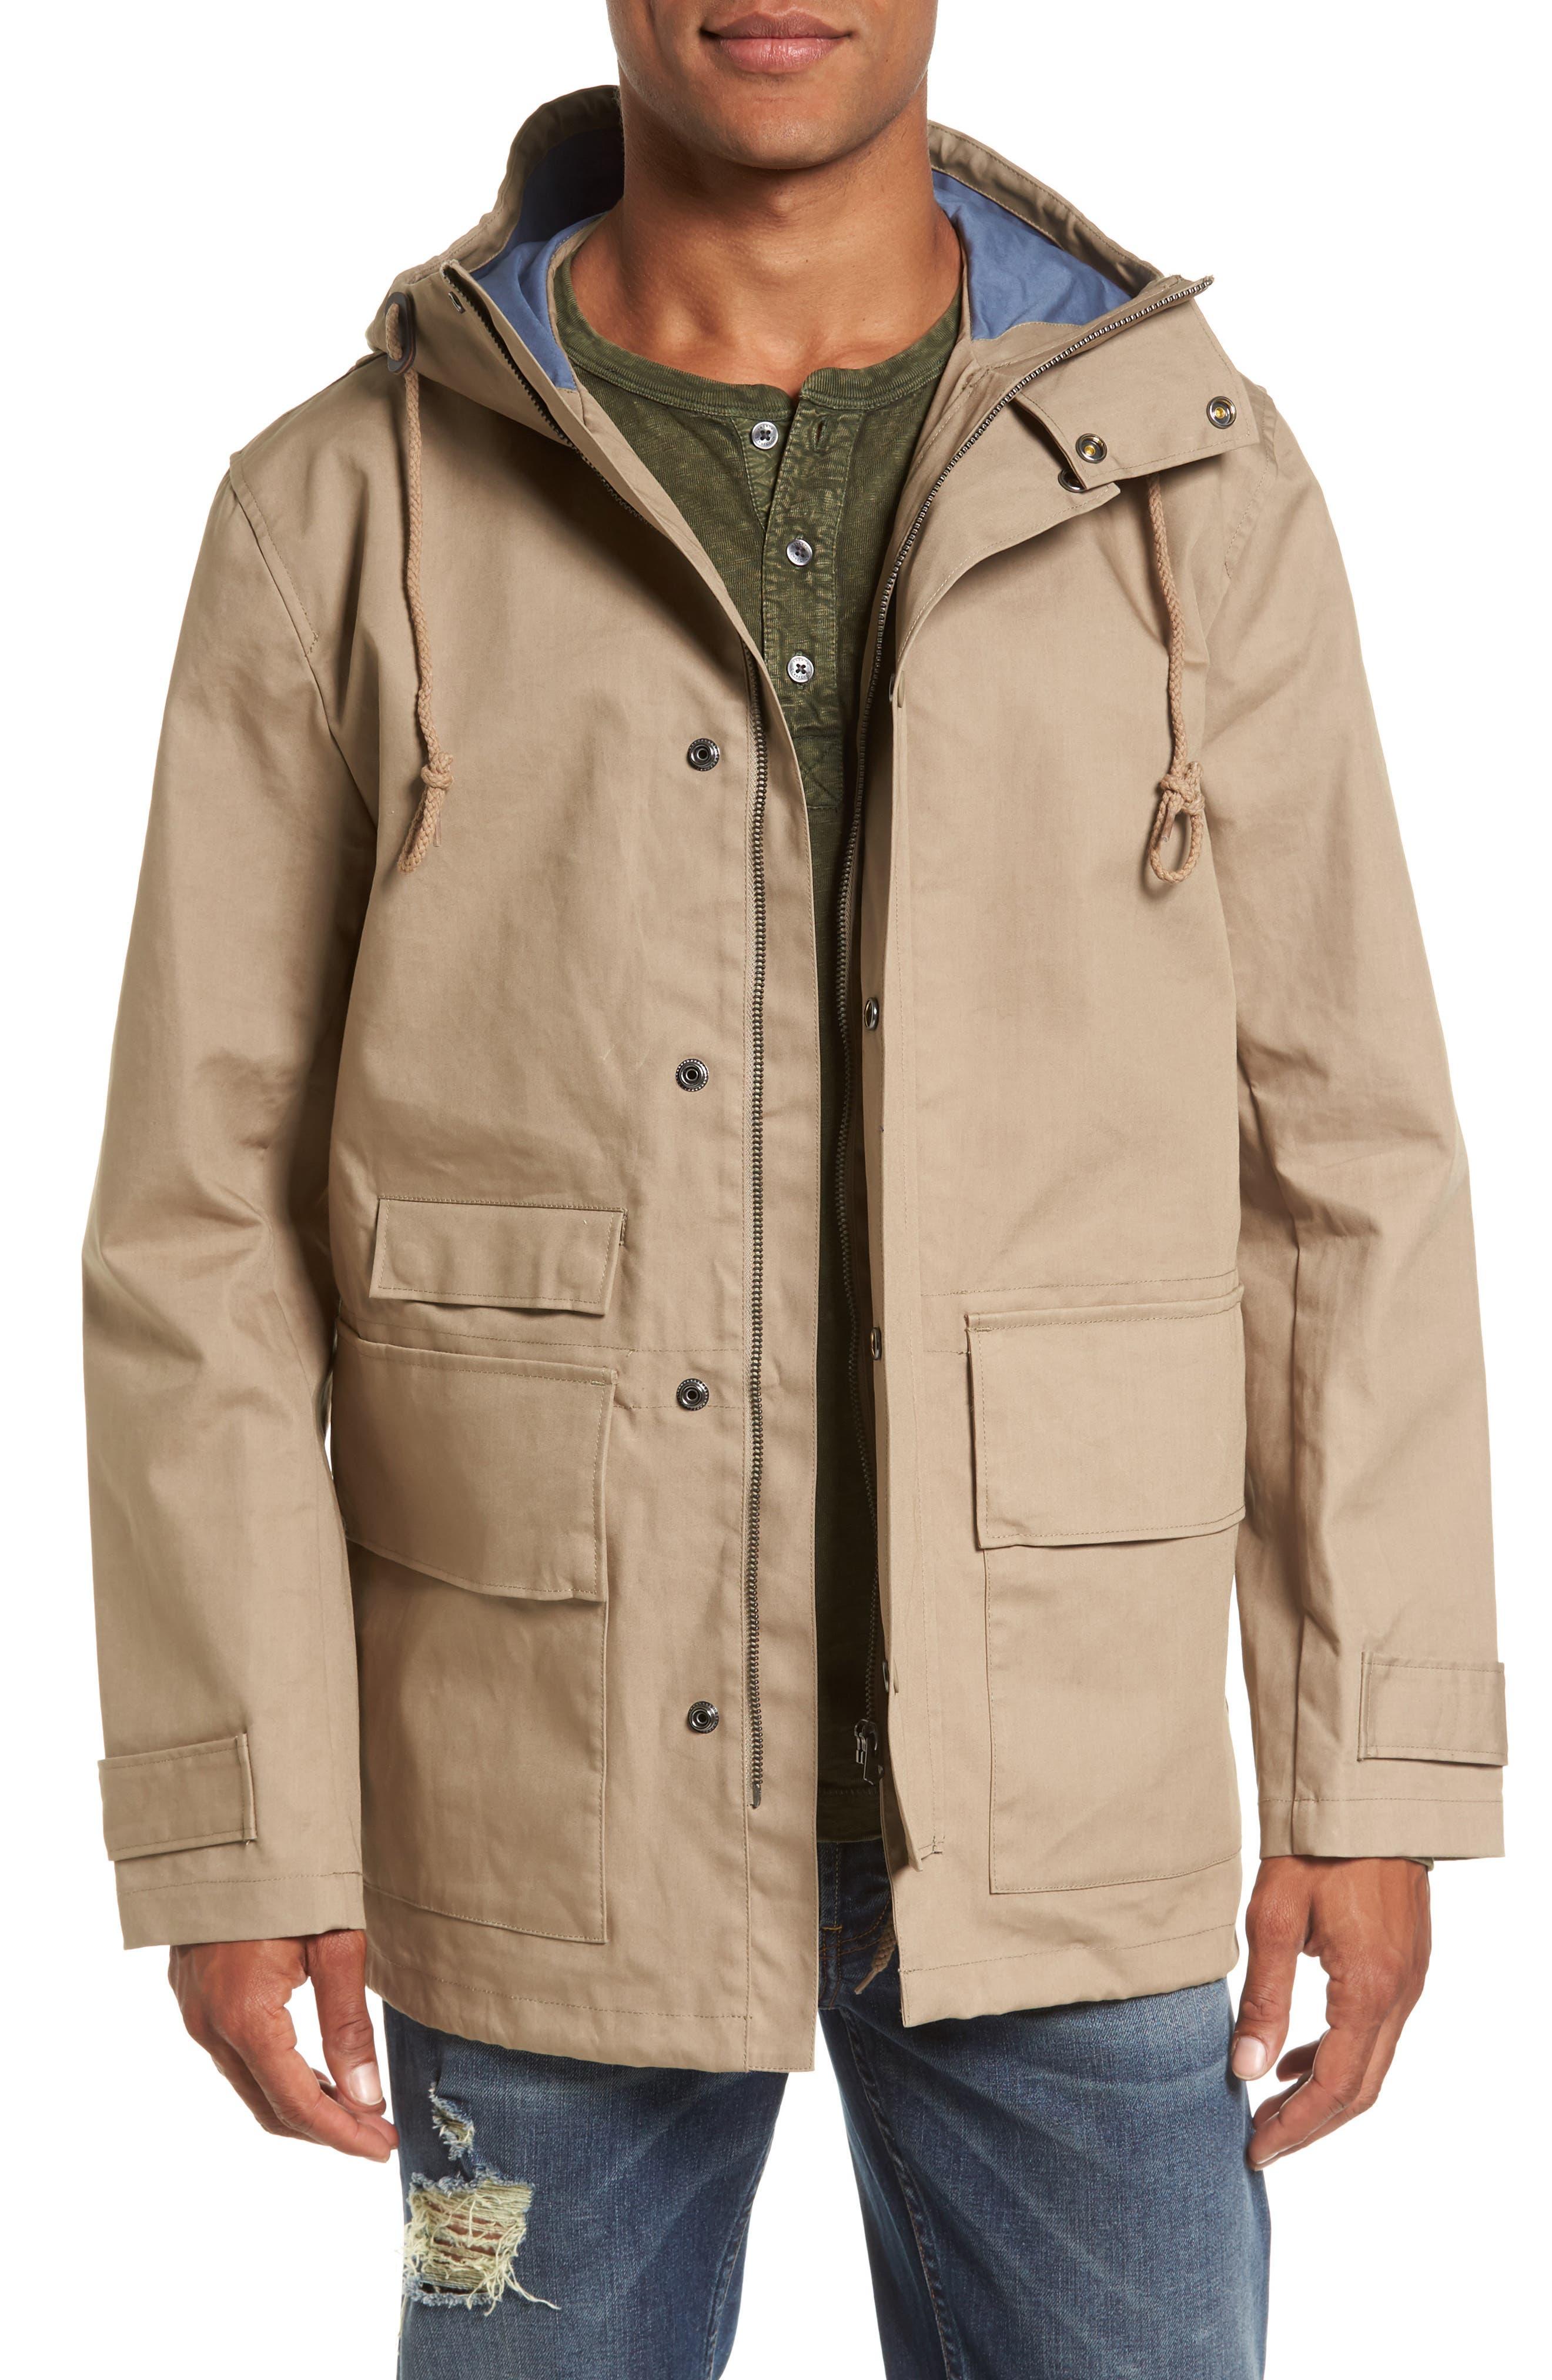 Regular Fit Hooded Rain Jacket,                             Main thumbnail 1, color,                             273